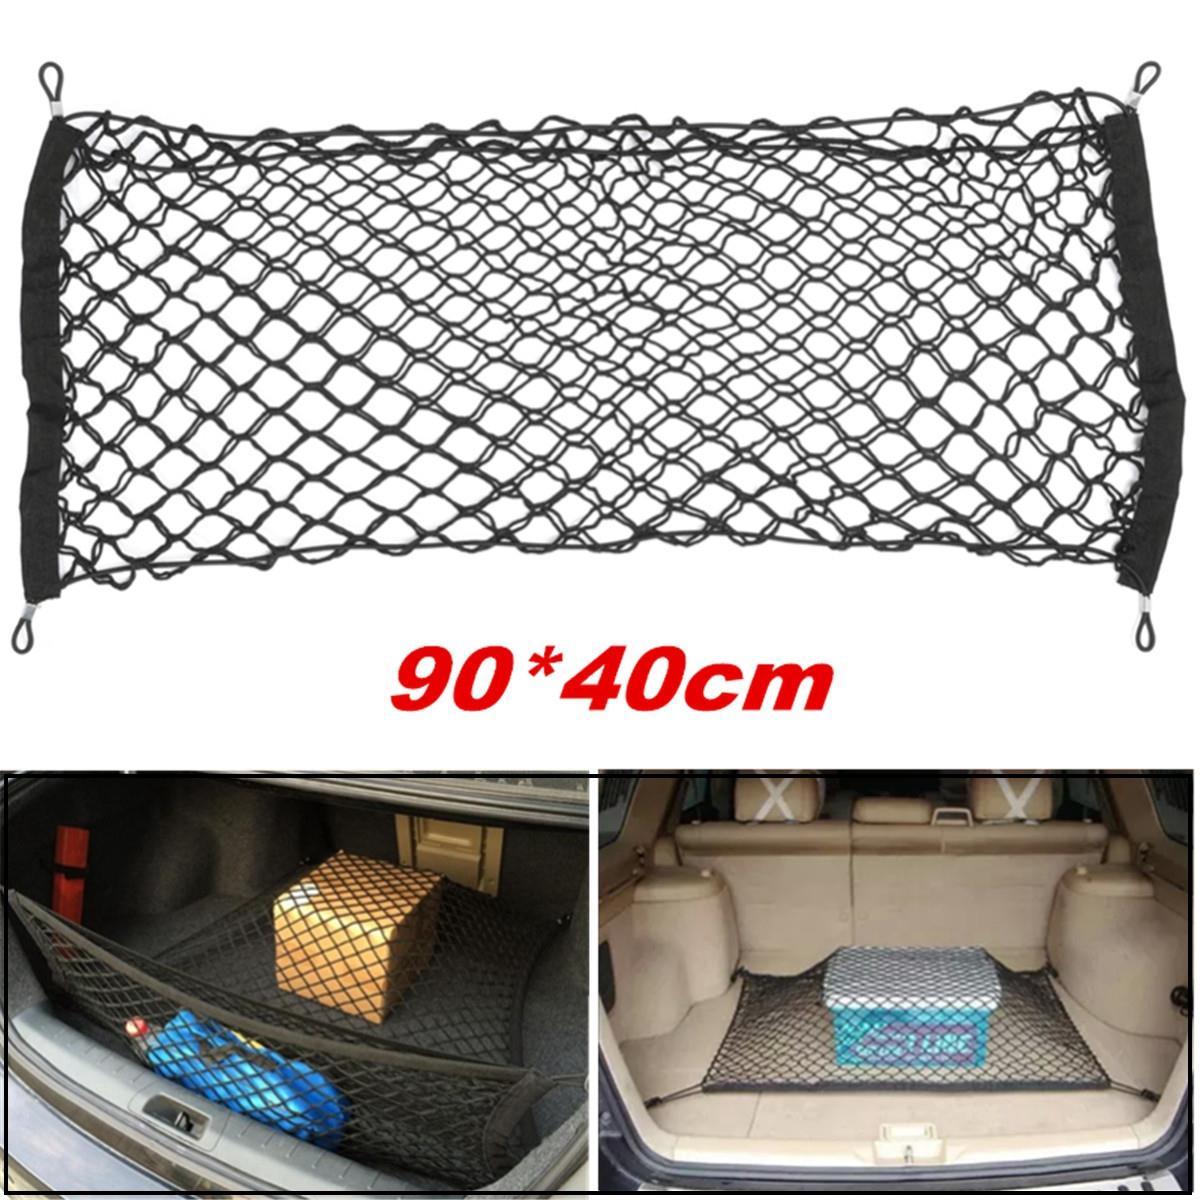 Trunk Car Rear Cargo Organizer Storage Elastic Carrier Mesh Net Nylon 90x40cm Car Interior Storage Bags Stowing Tidying